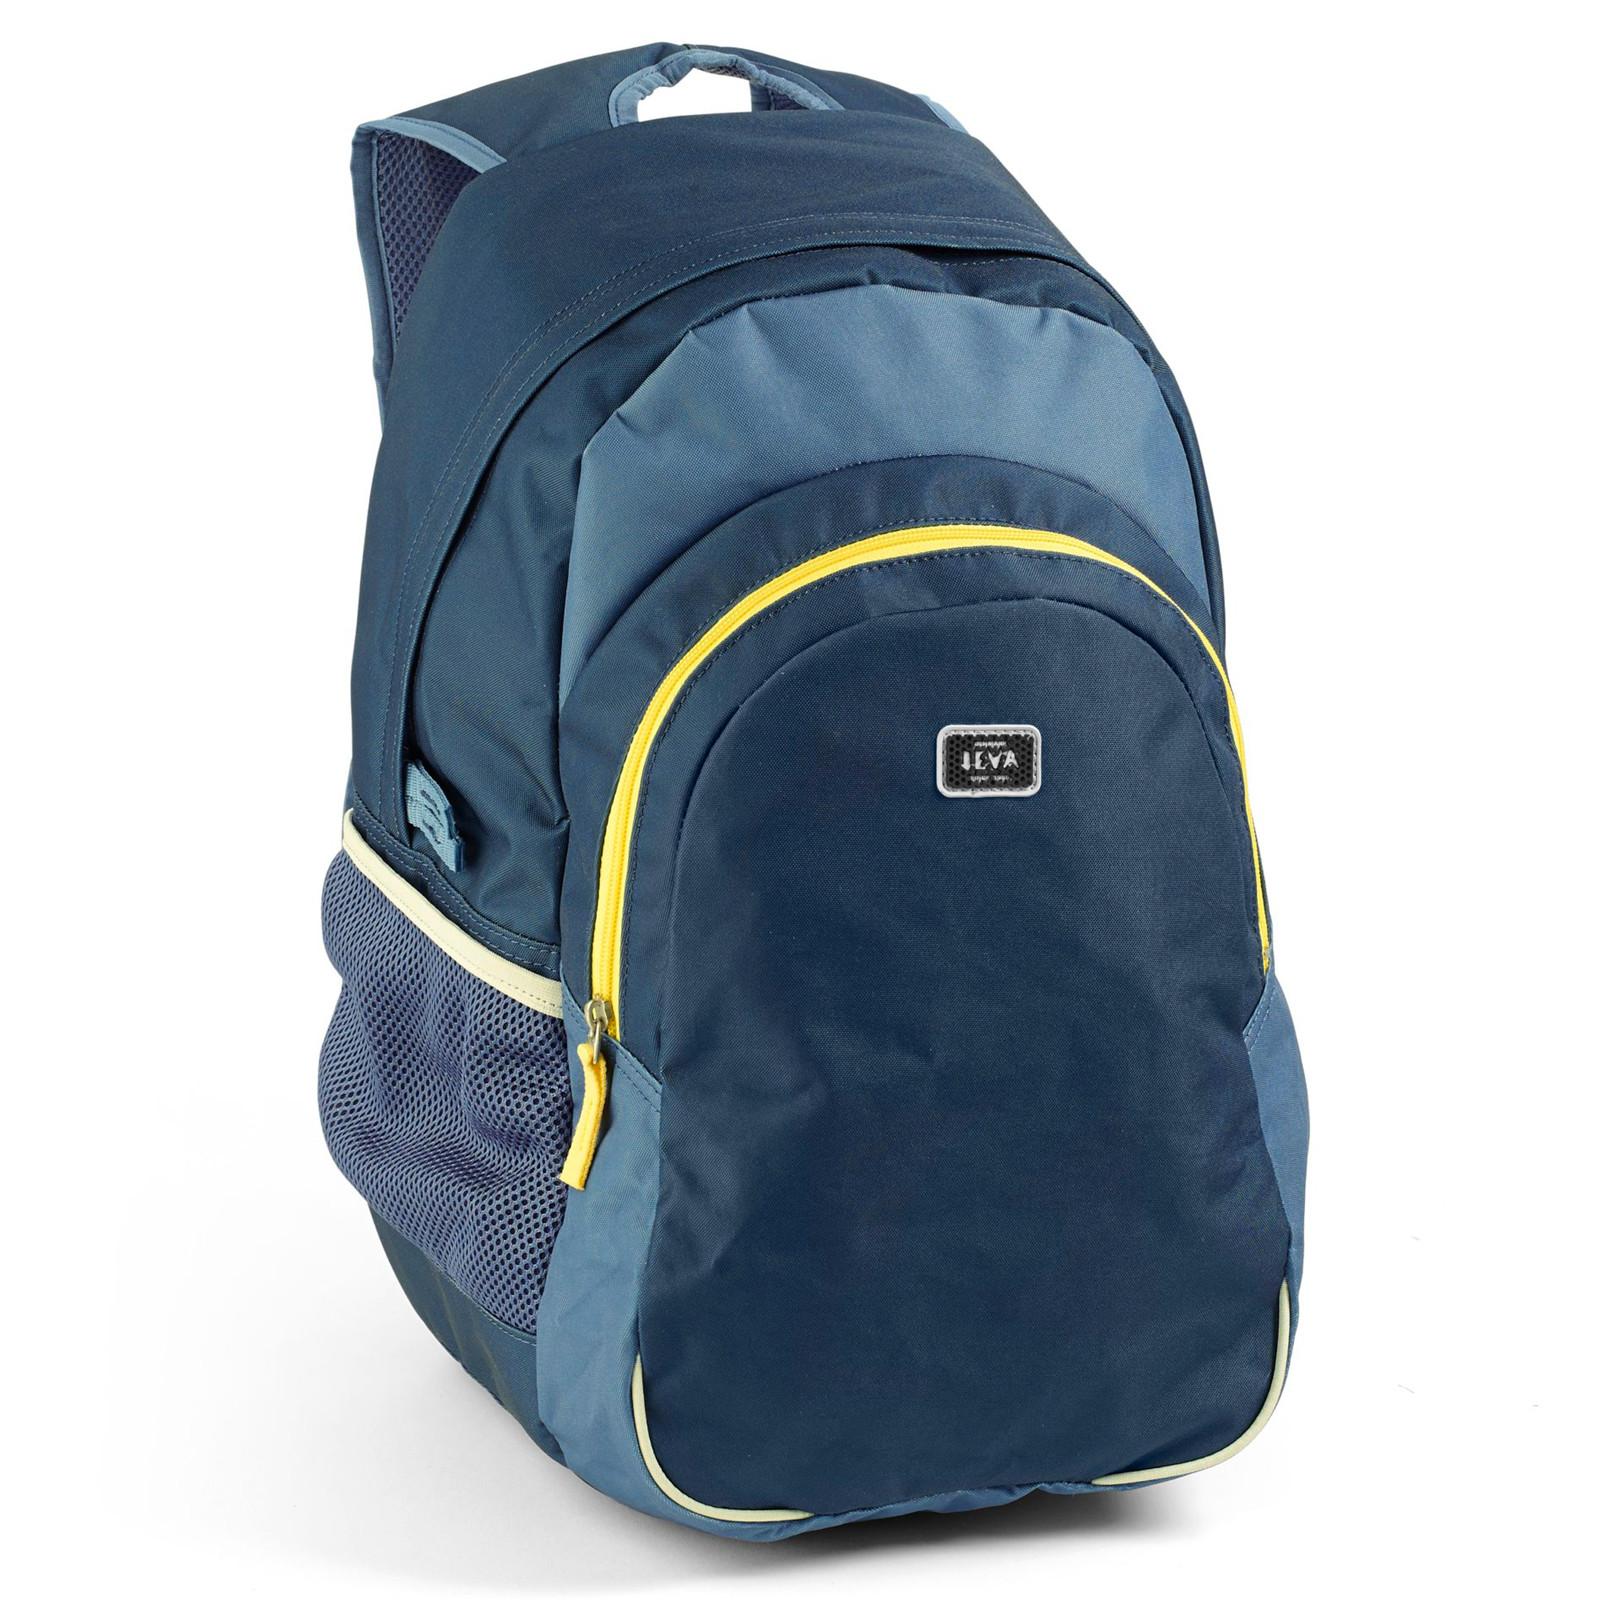 8ff49a25fa6 Tasker og kufferter online - DK's største udvalg